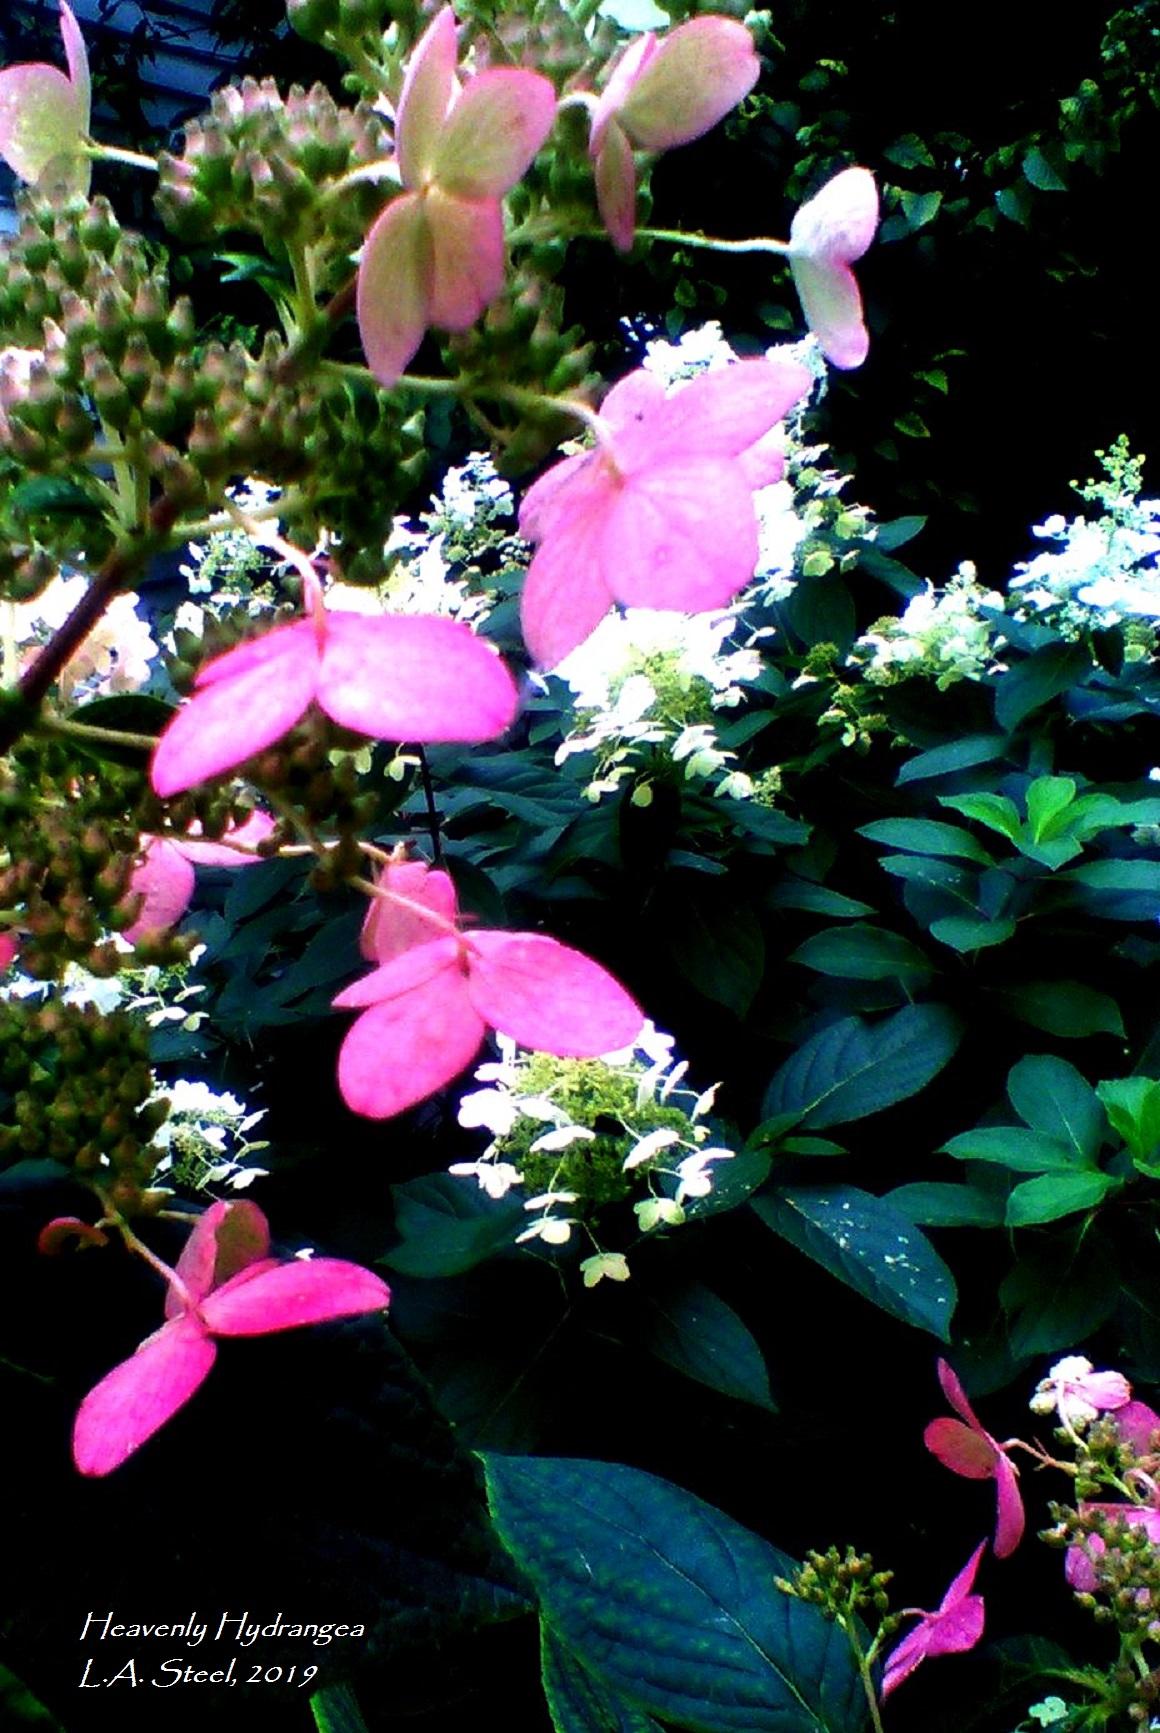 heavenly hydrangea 5 2019